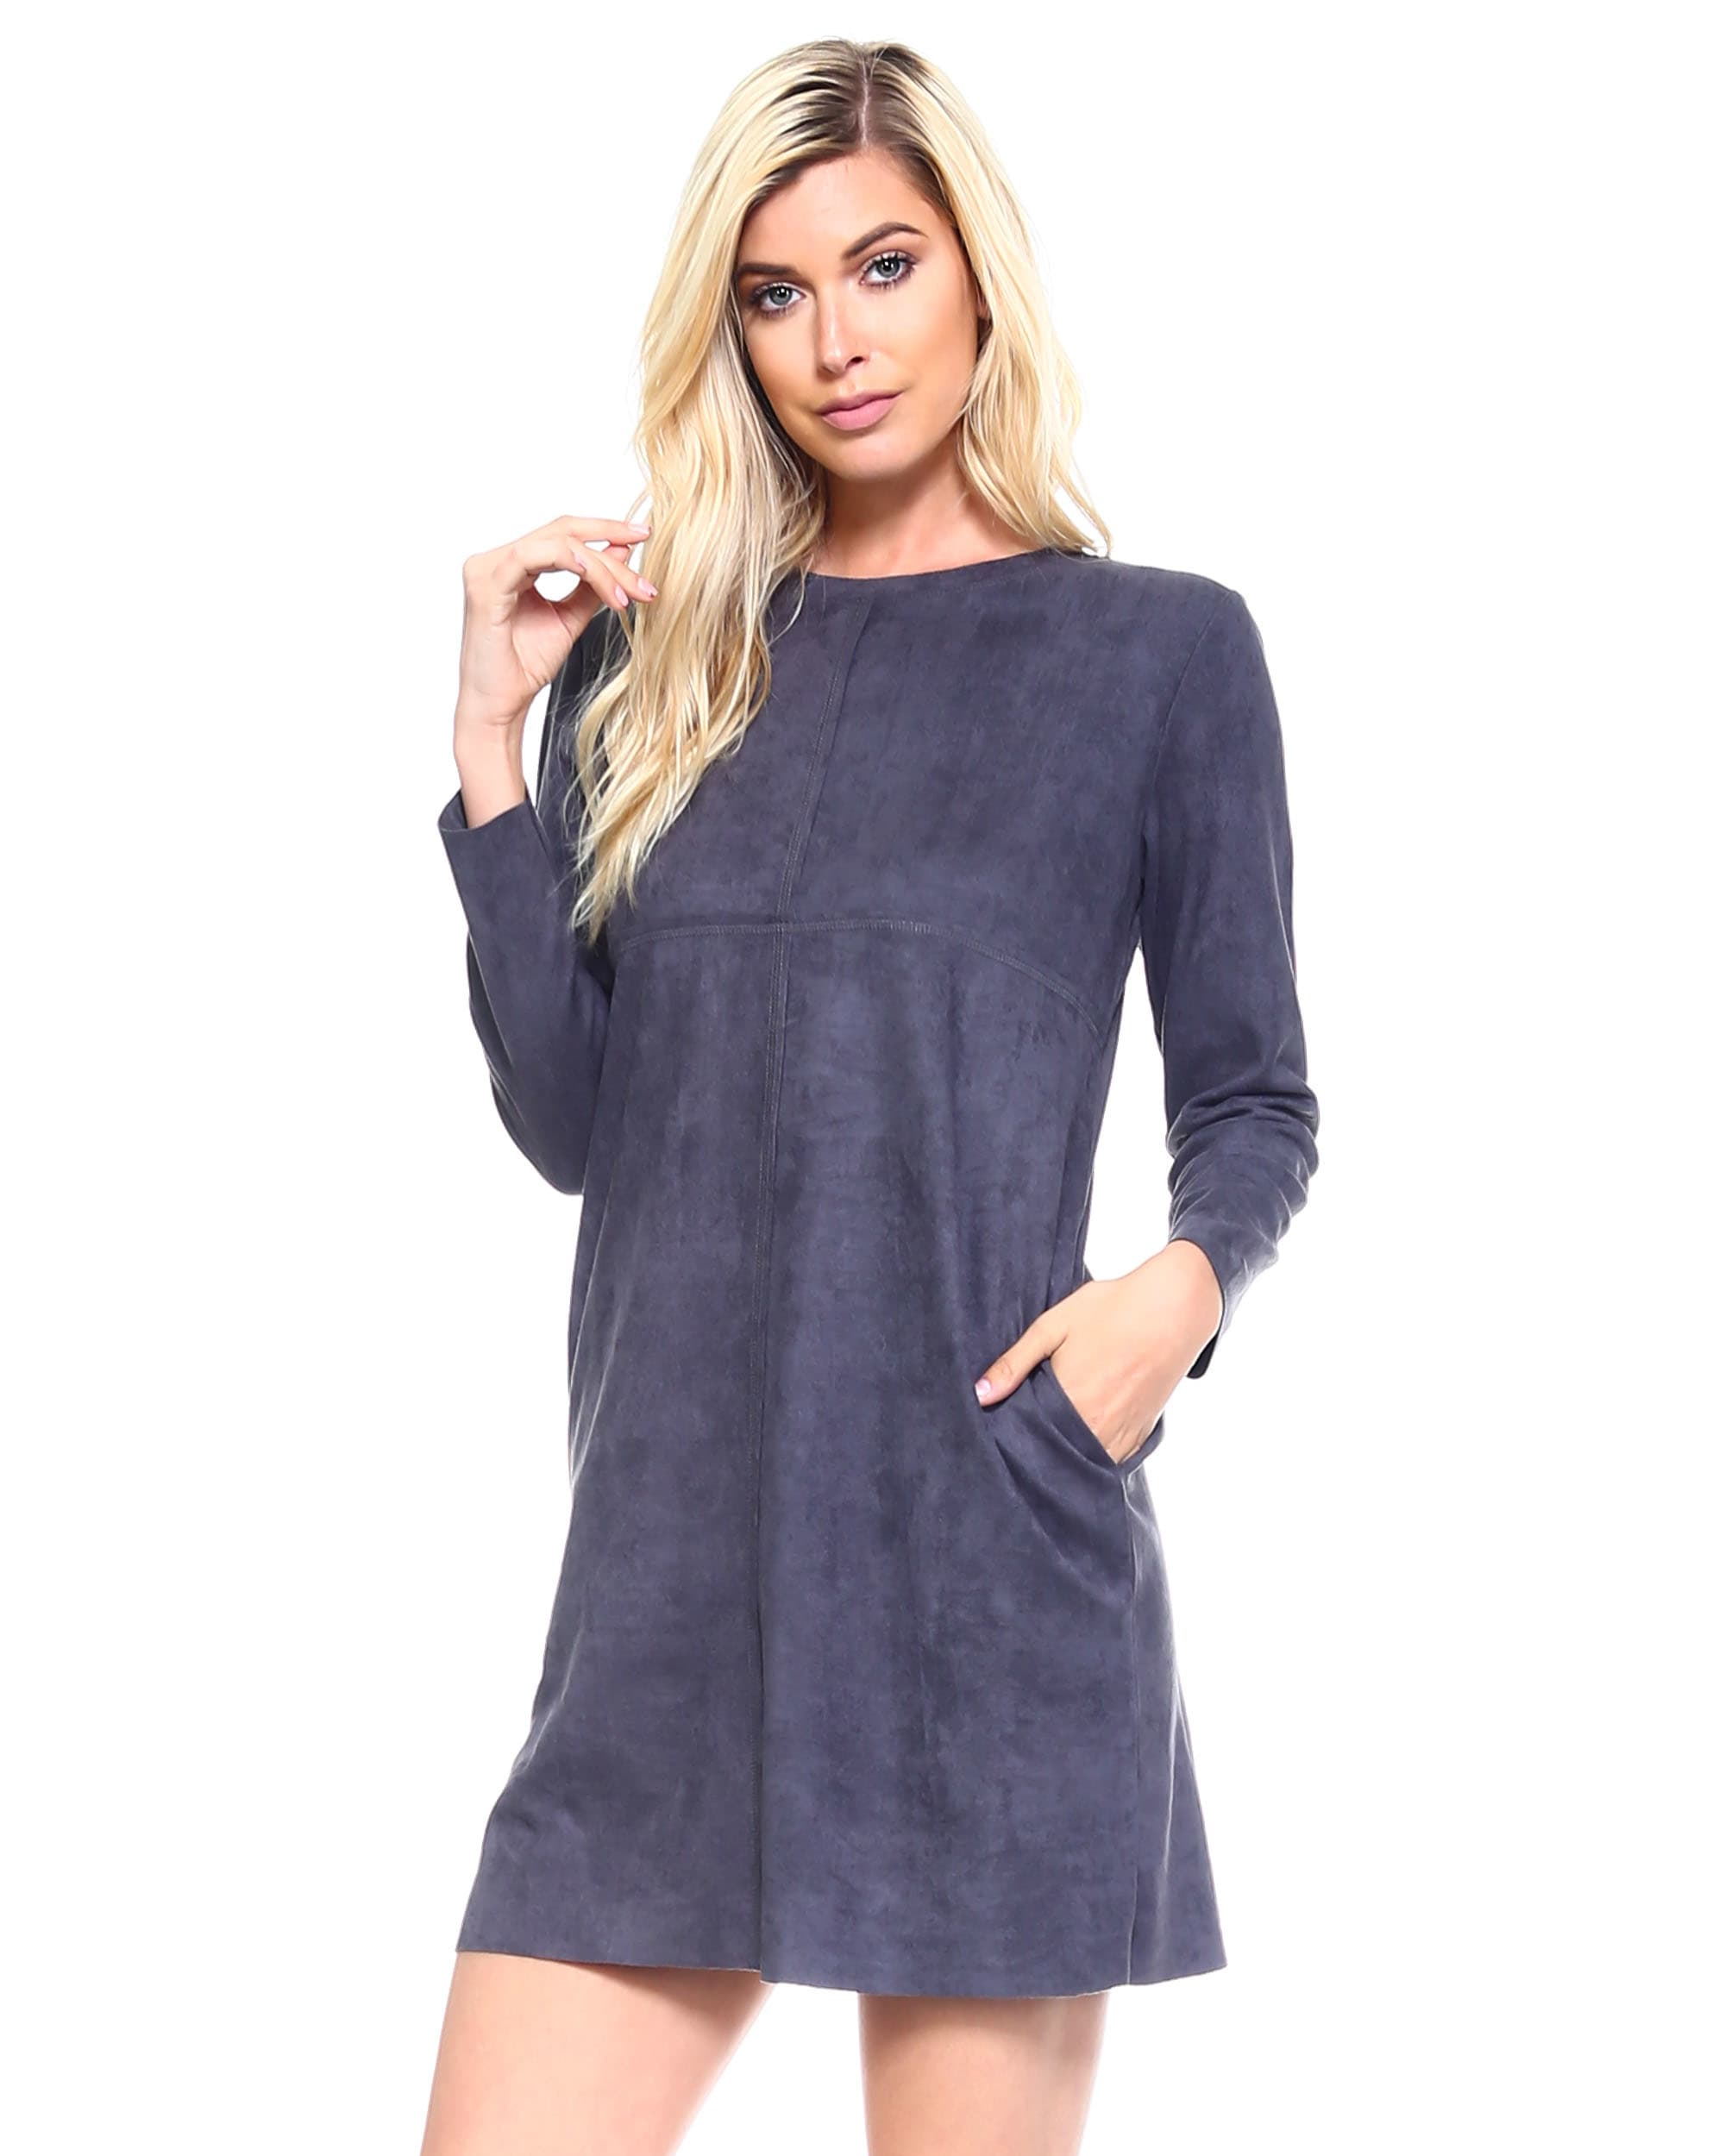 Faux Suede Aurora Dress - Charcoal - Front